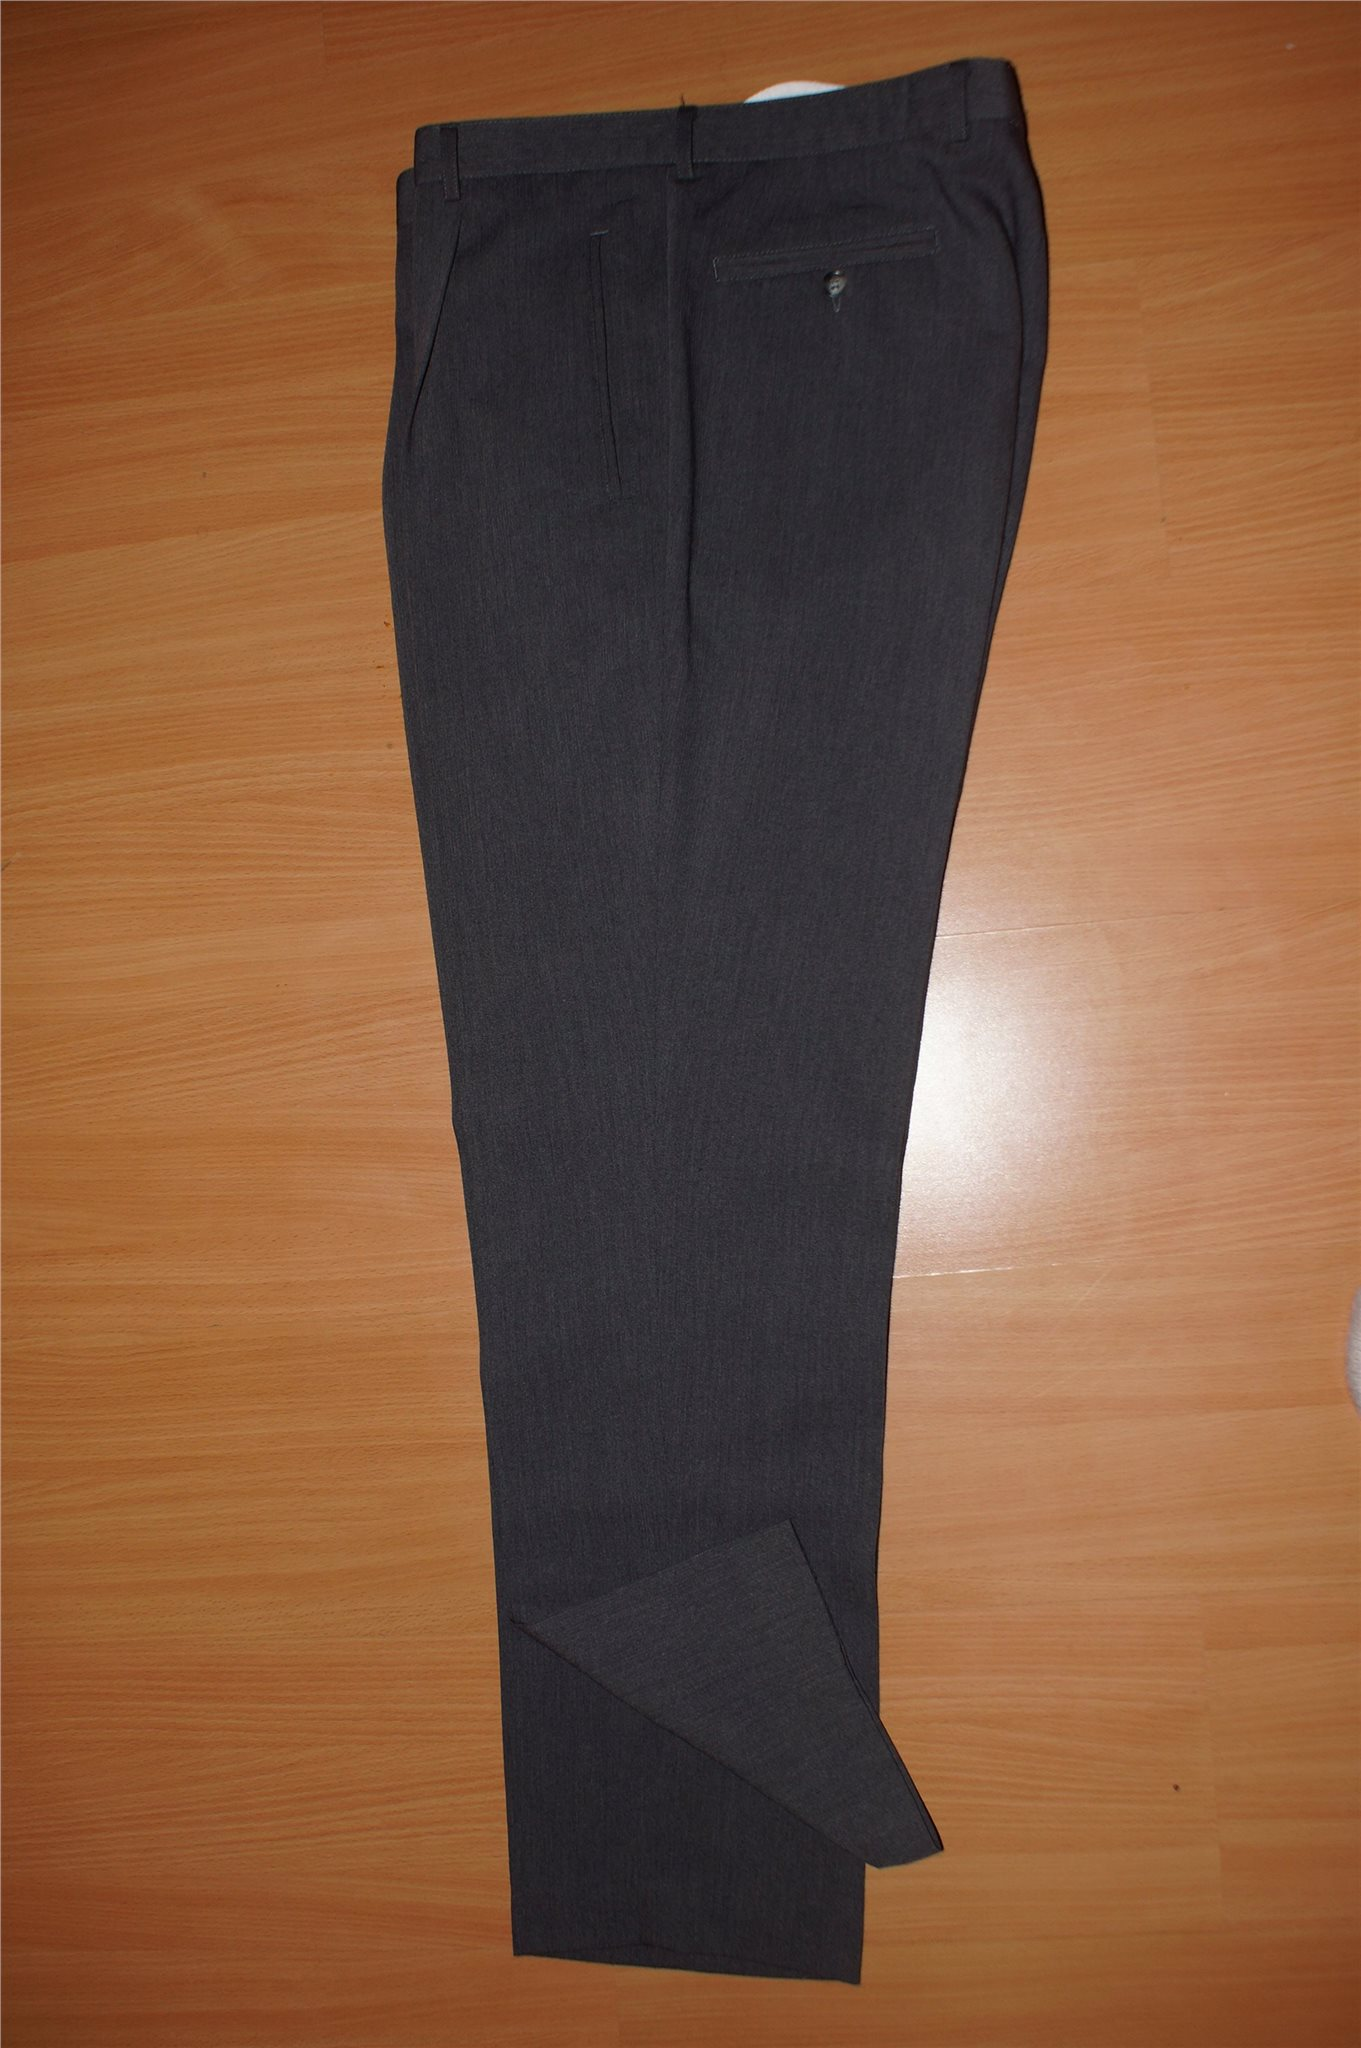 d068f19afe2c Klassiska byxor str S grå kostymbyxor 4YOU tunn.. (351815993) ᐈ Köp ...